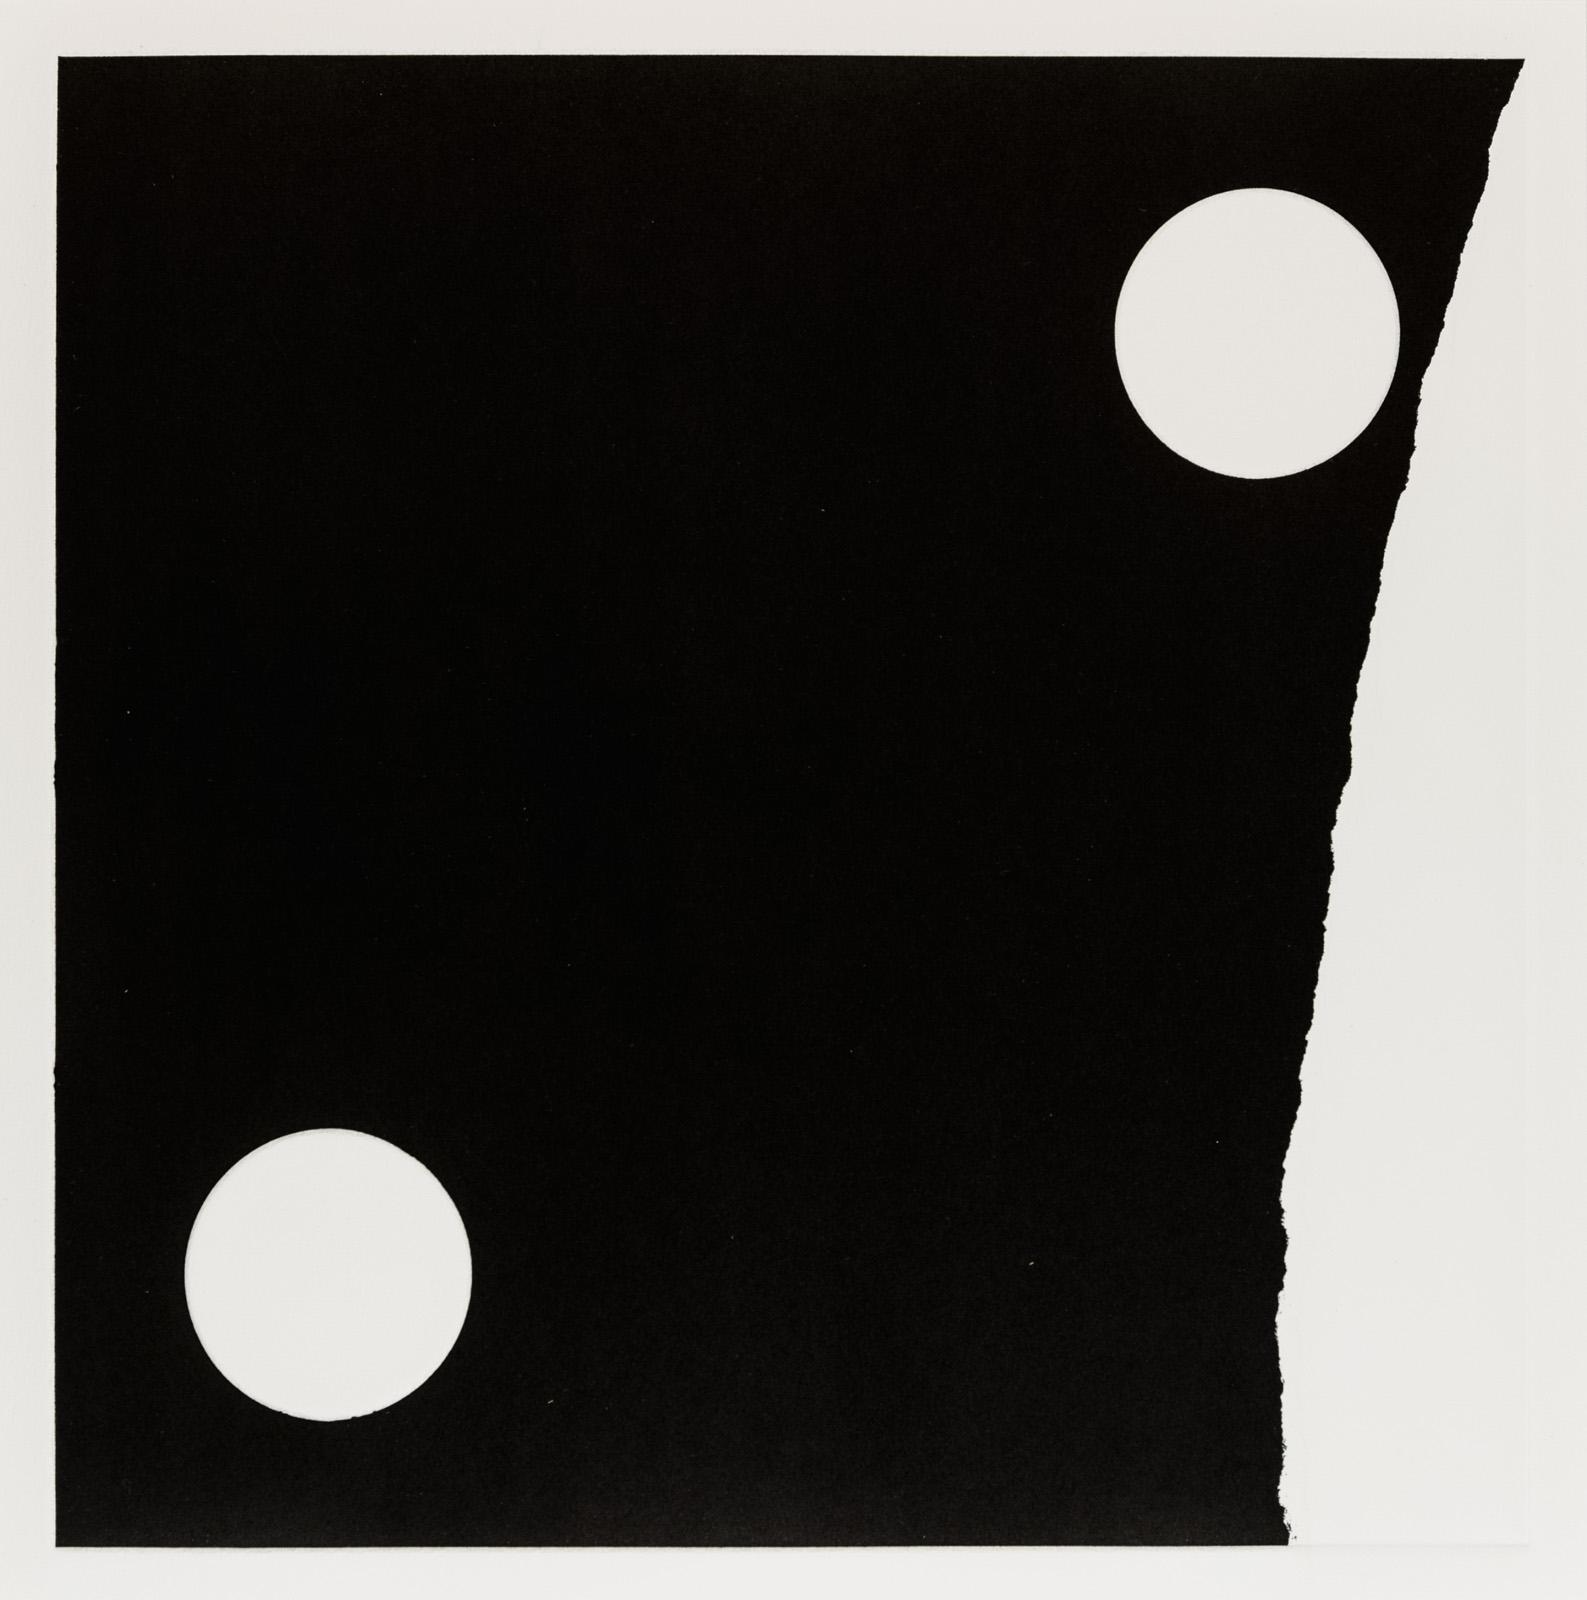 Kristina Matousch, What Lies Ahead 2, 2017, Unique print from an edition of 8, 31,5 x 31,5 cm